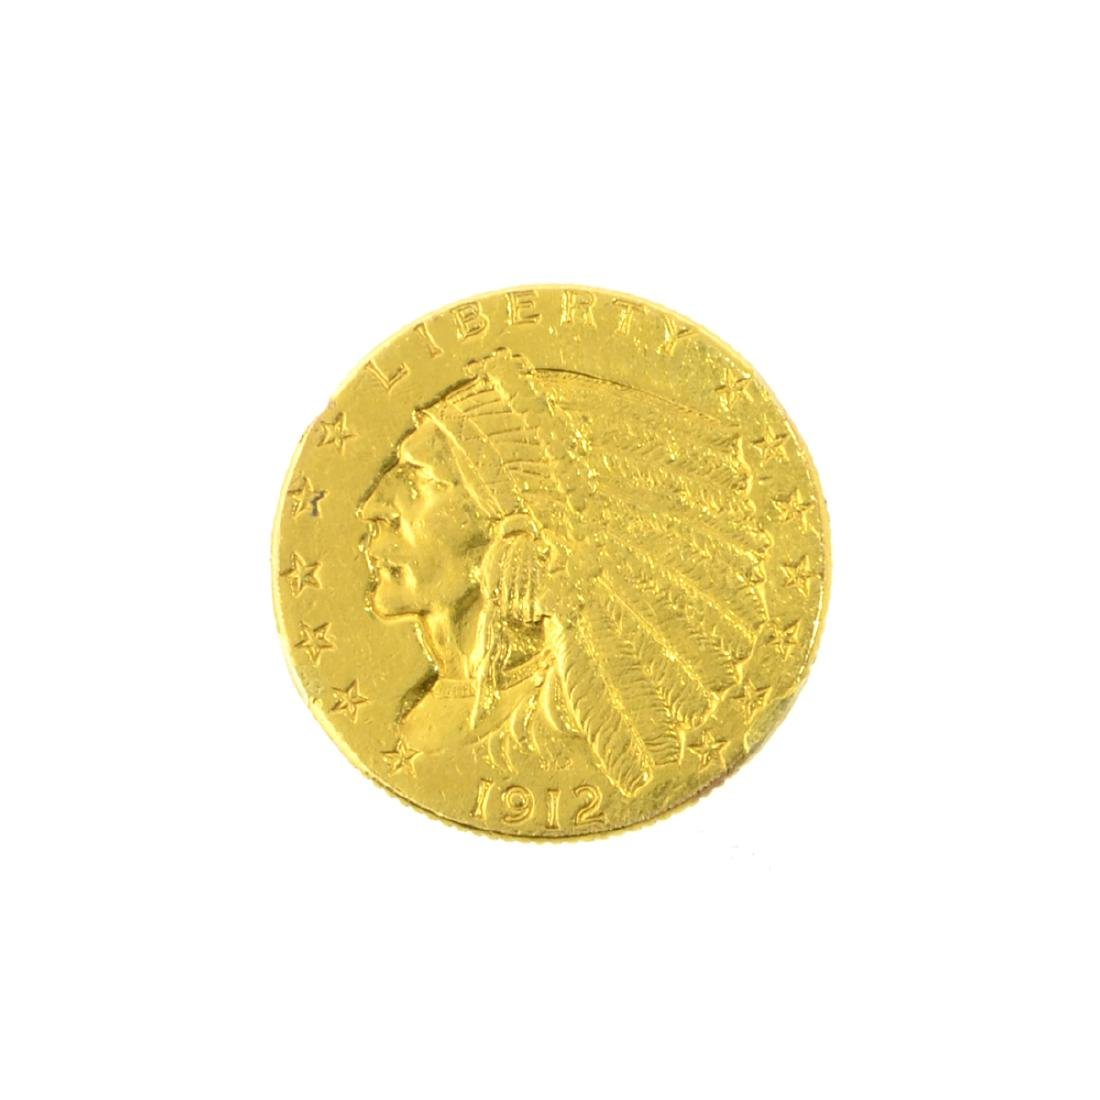 *1912 $2.50 U.S. Indian Head Gold Coin (JG-JWJ)